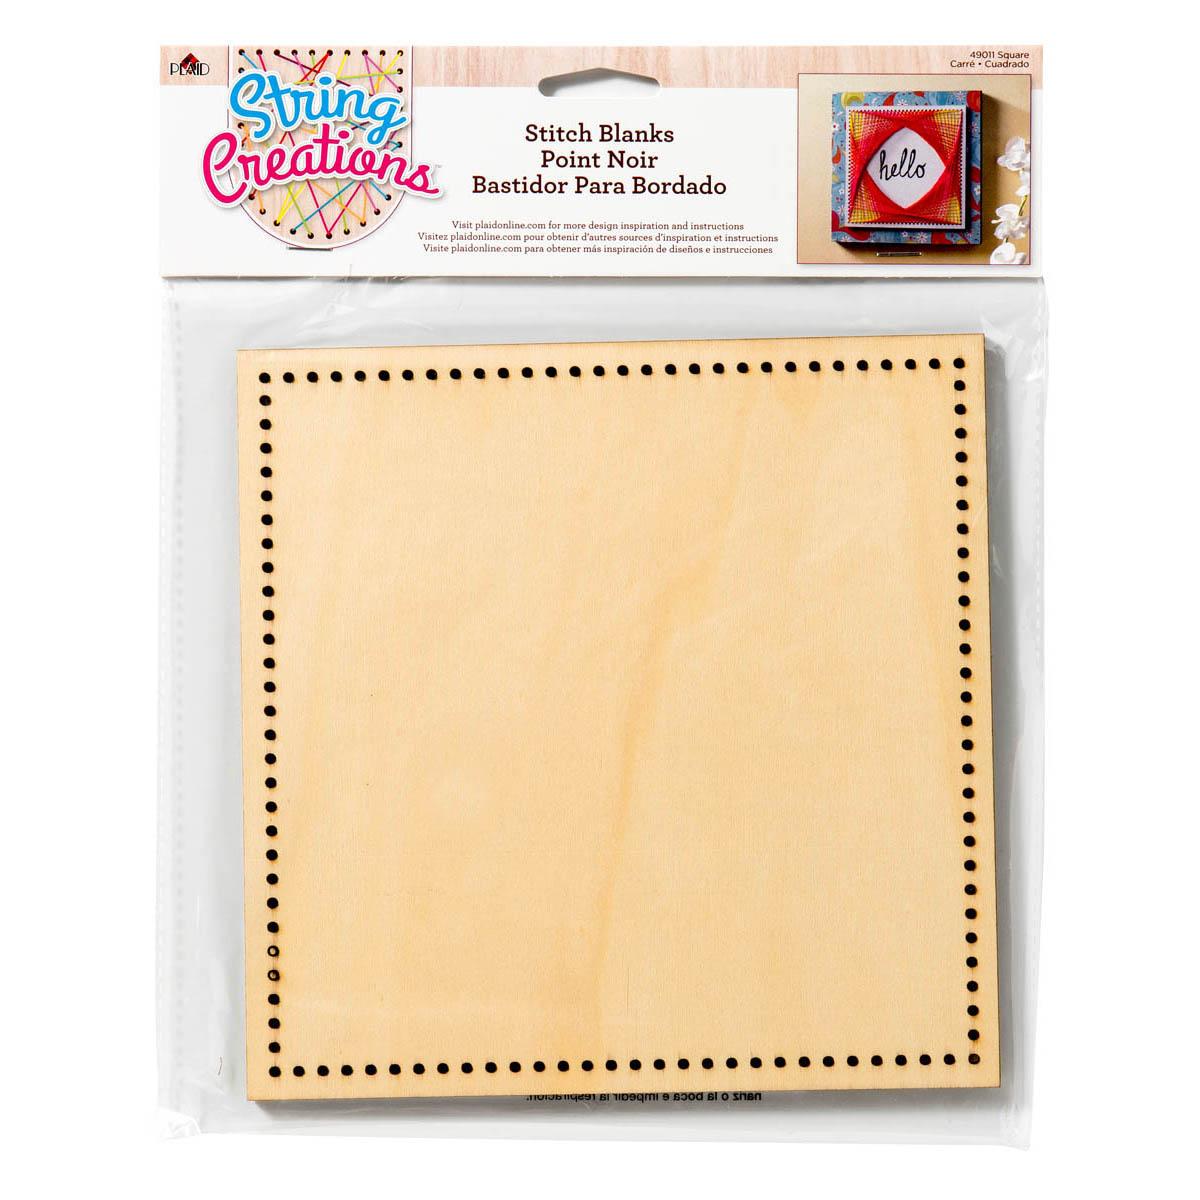 Bucilla ® String Creations™ Stitch Blanks - Square, Border Grid - 49011